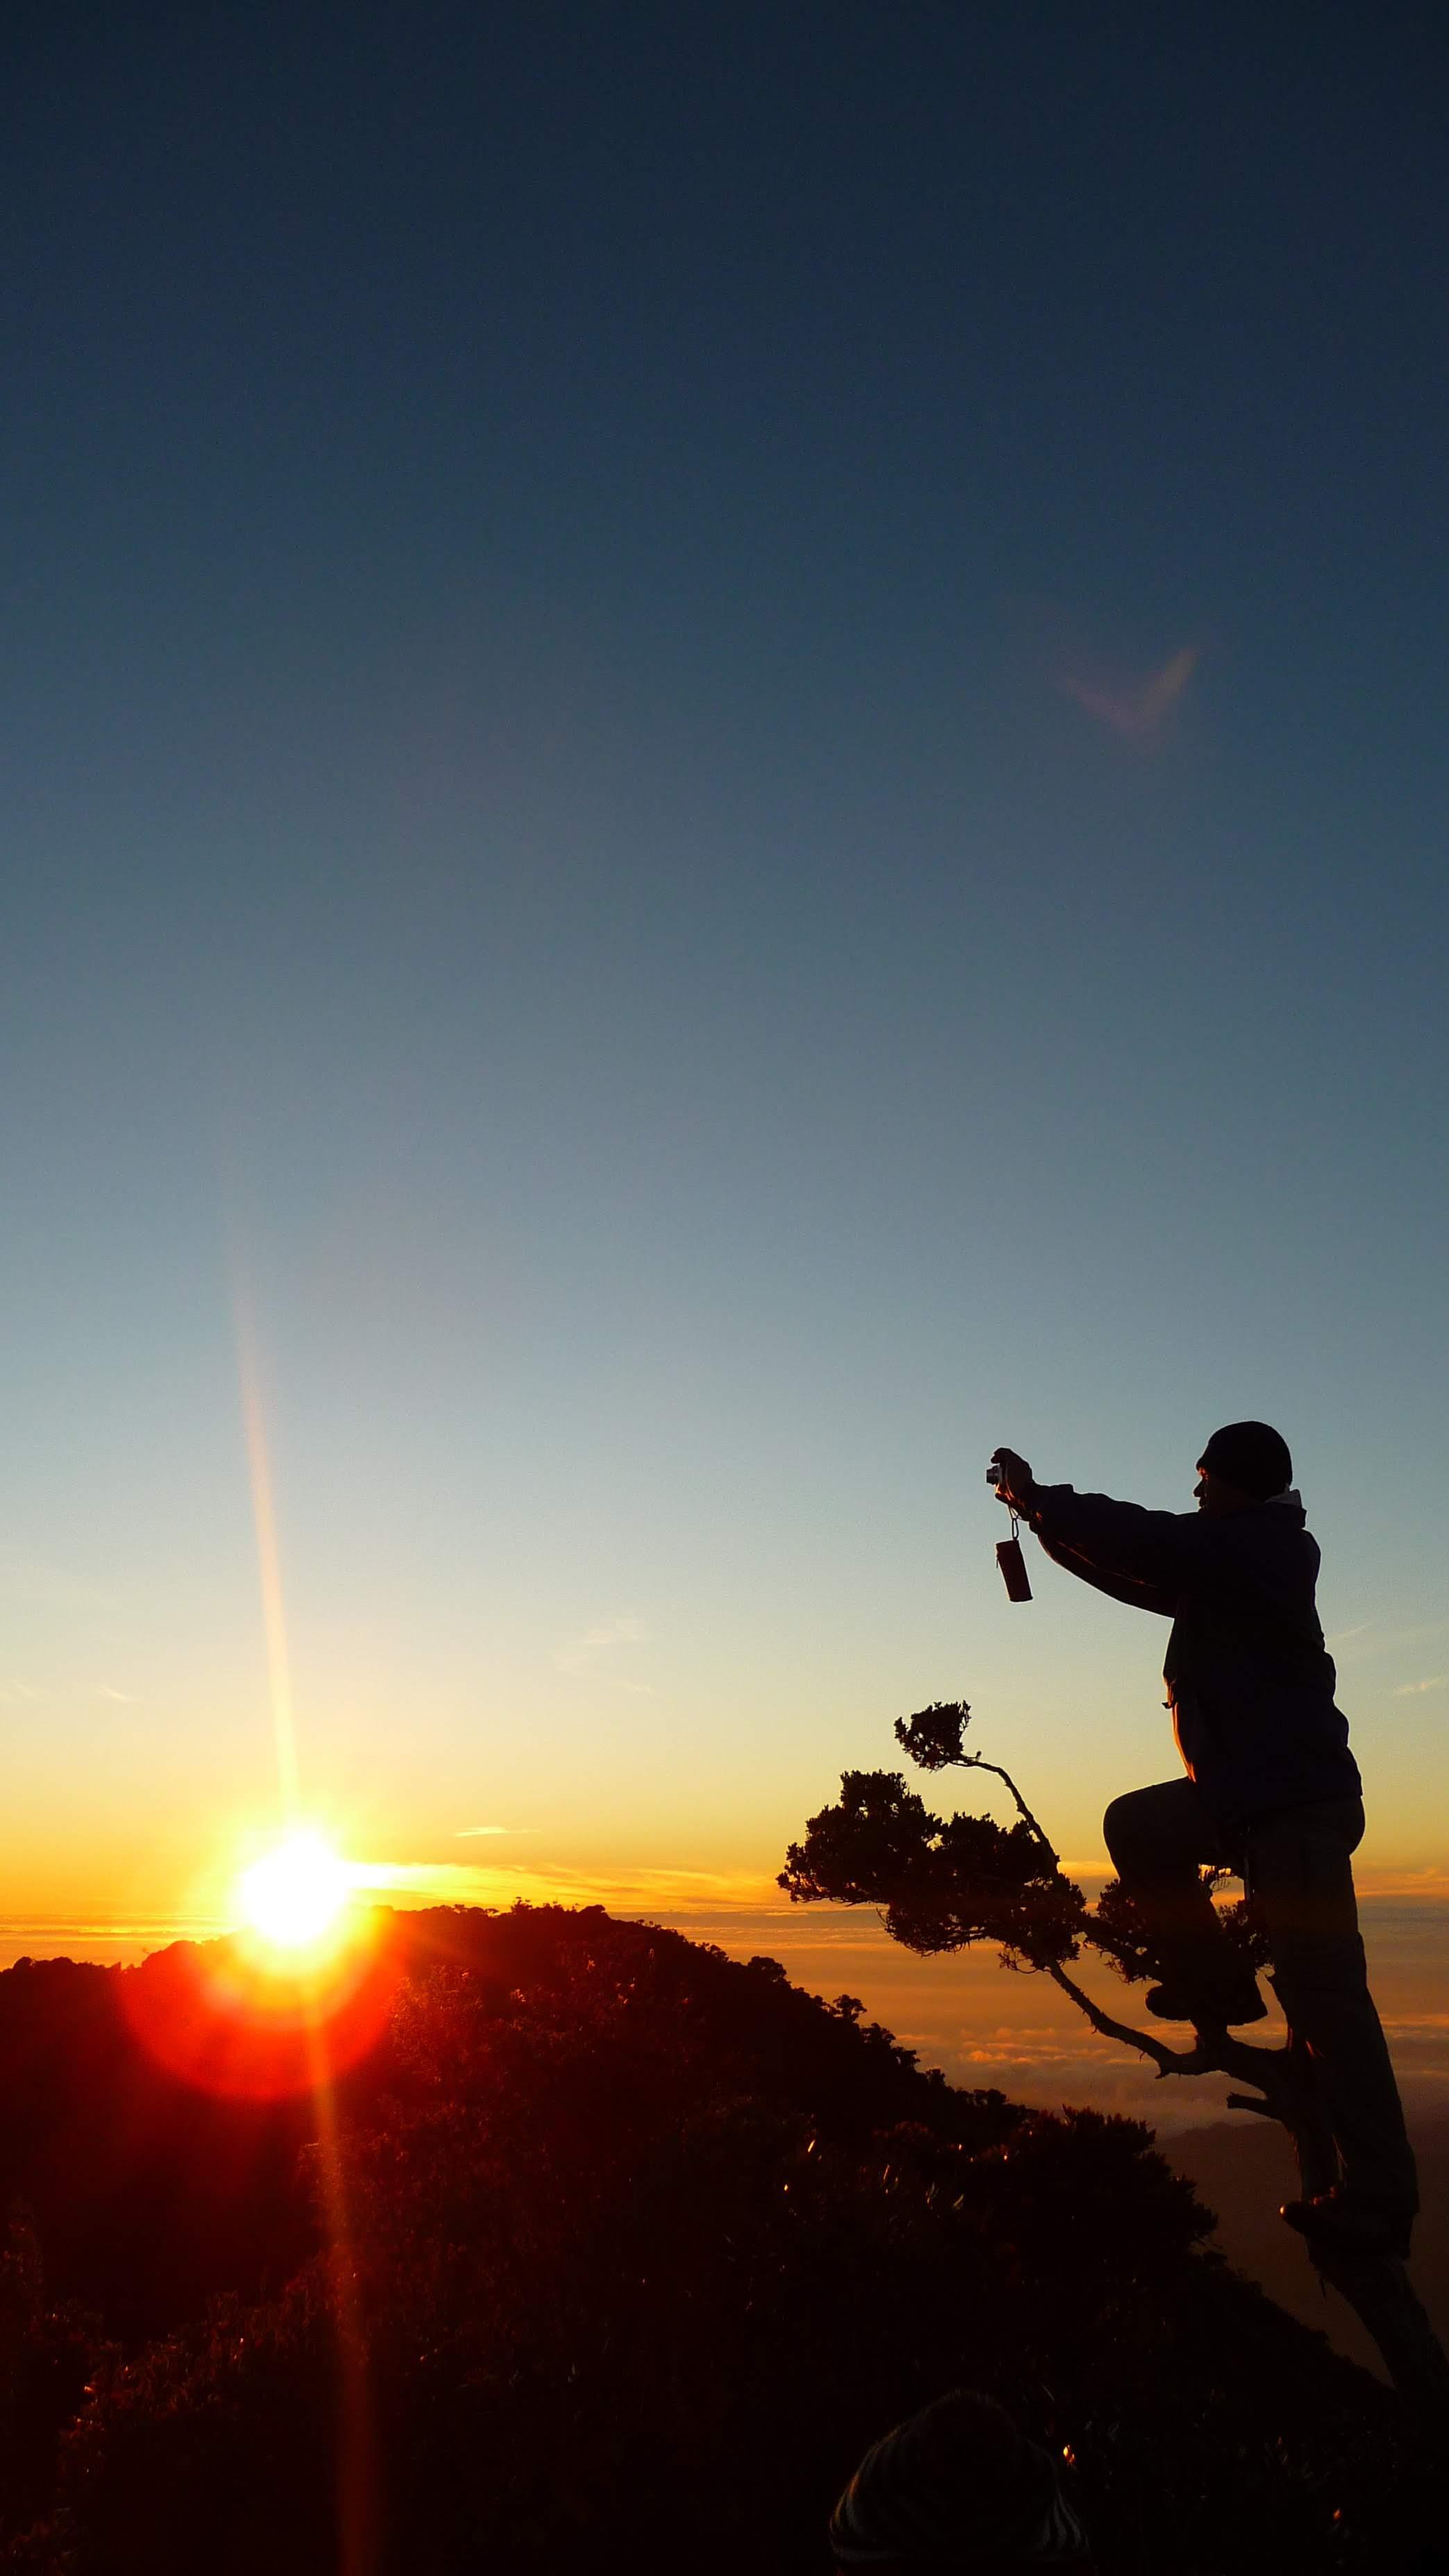 dawn-photographer-summit-of-mt-napulawan_7828585626_o.jpg